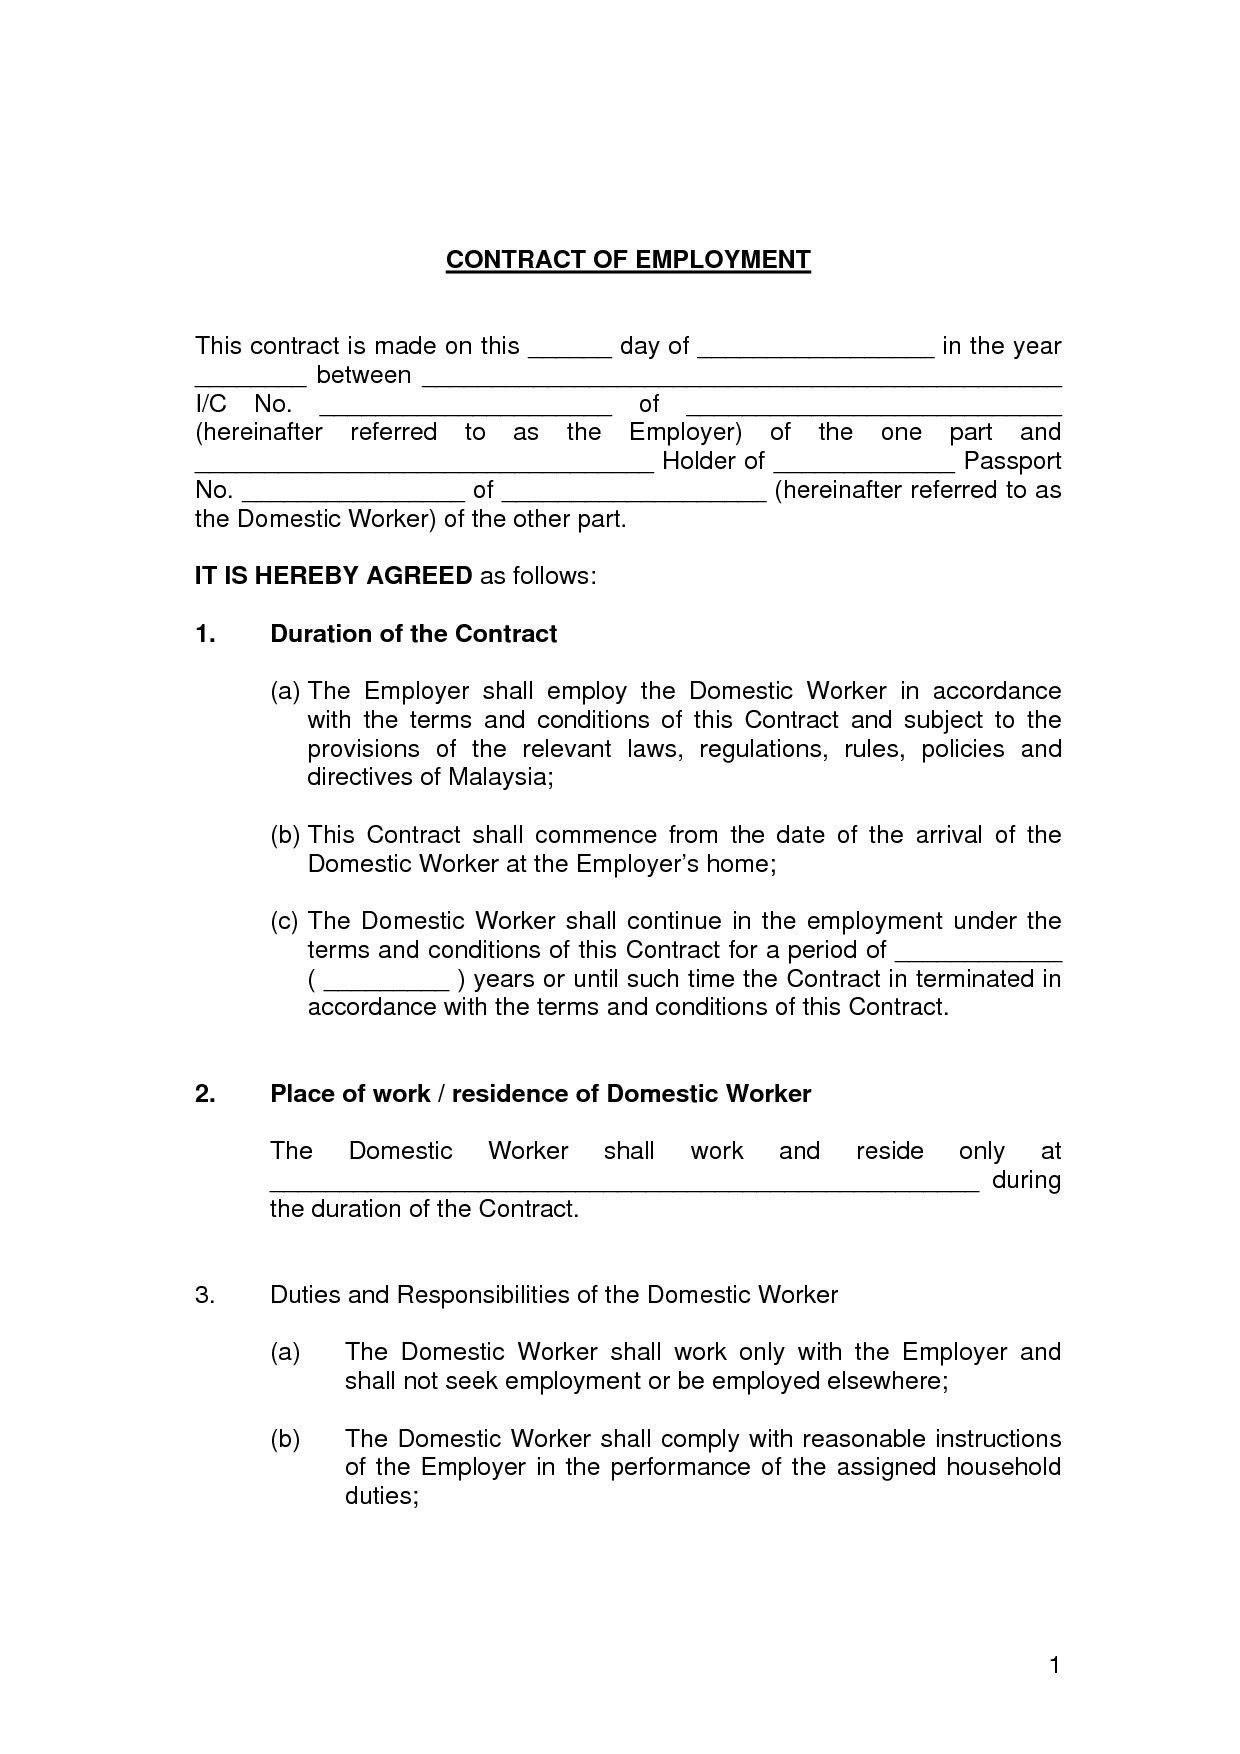 Erstaunlich Free Contractor Agreement Template Loan Agreement Template Microsoft Word Templates Qpfwvy Payment Agree Contract Template Domestic Worker Contract Nj home improvement contract template